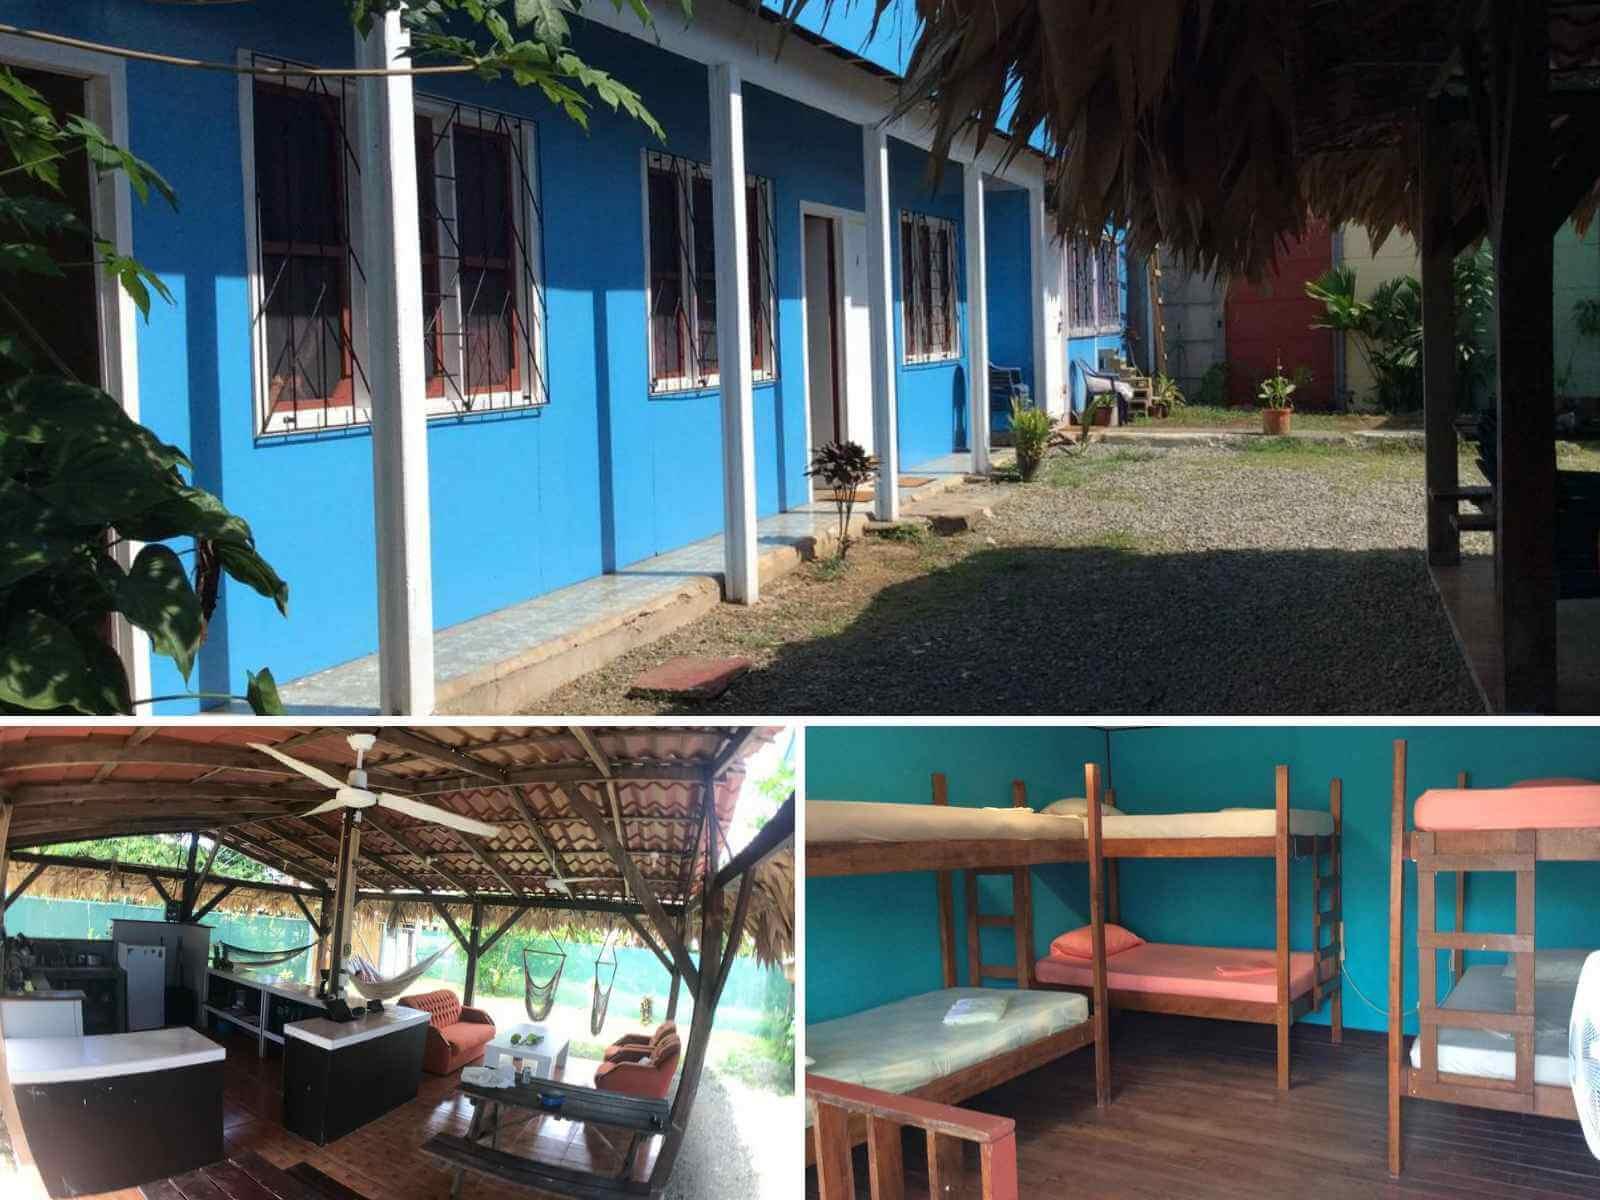 Hostel Puerto Viejo - Hotel One Love Puerto Viejo